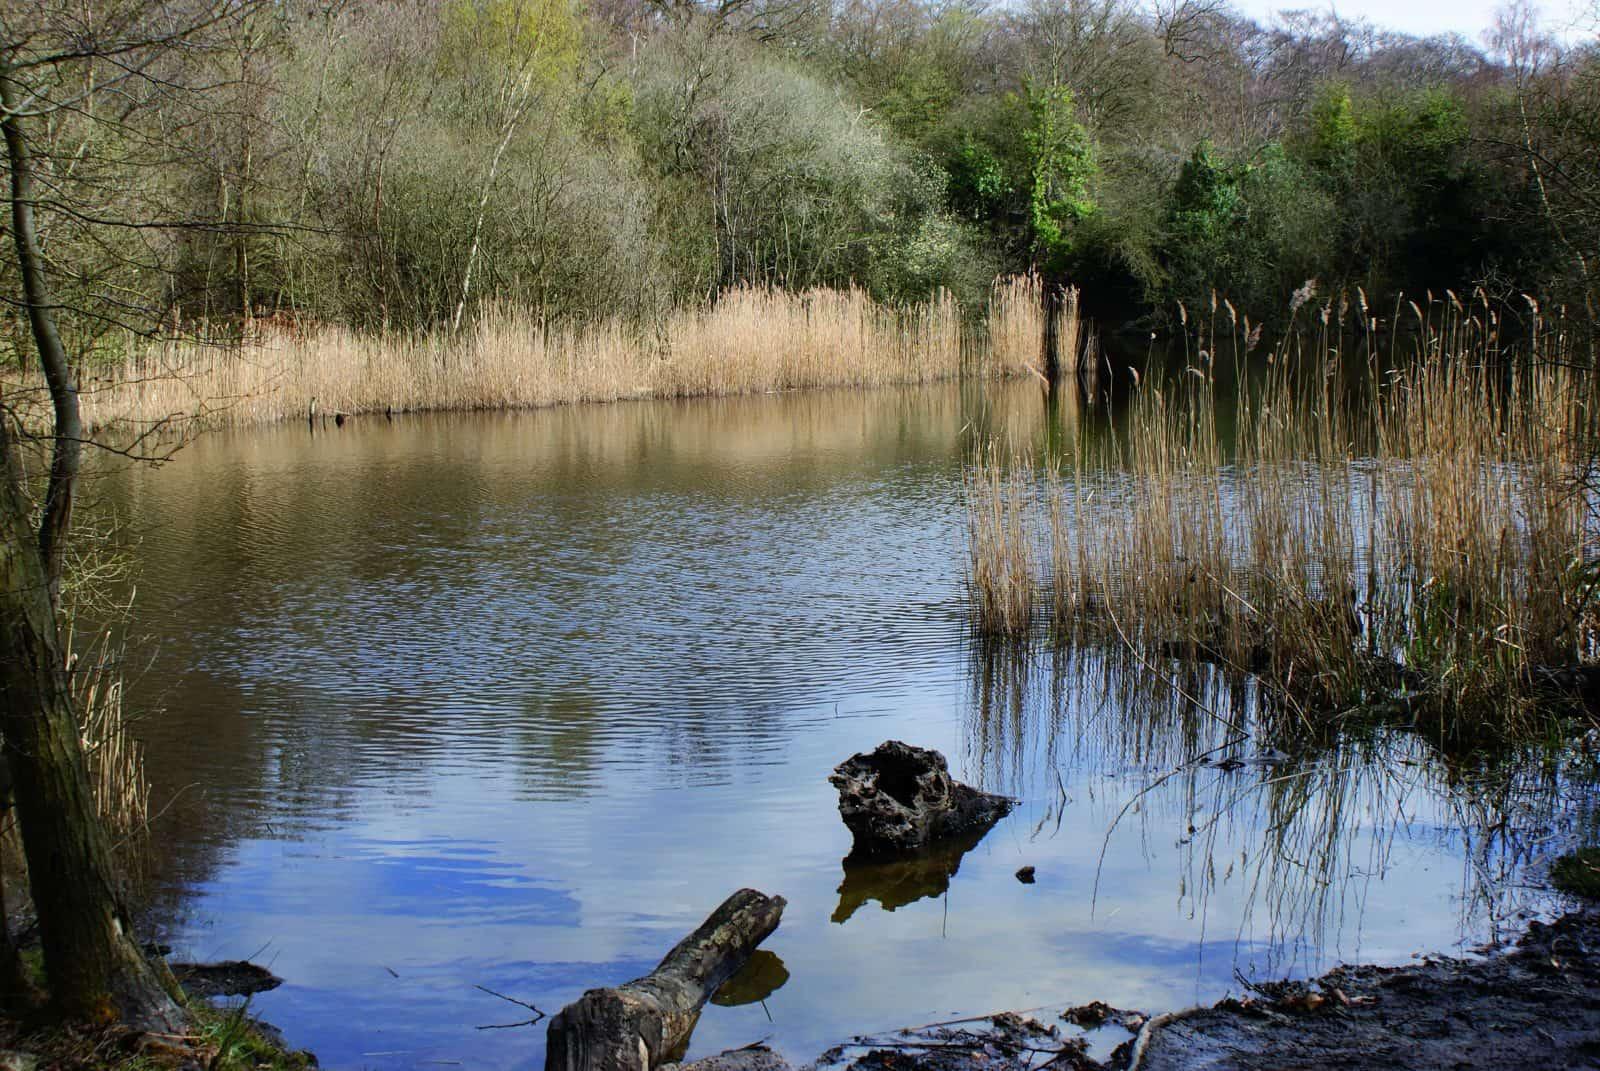 A freshwater habitat